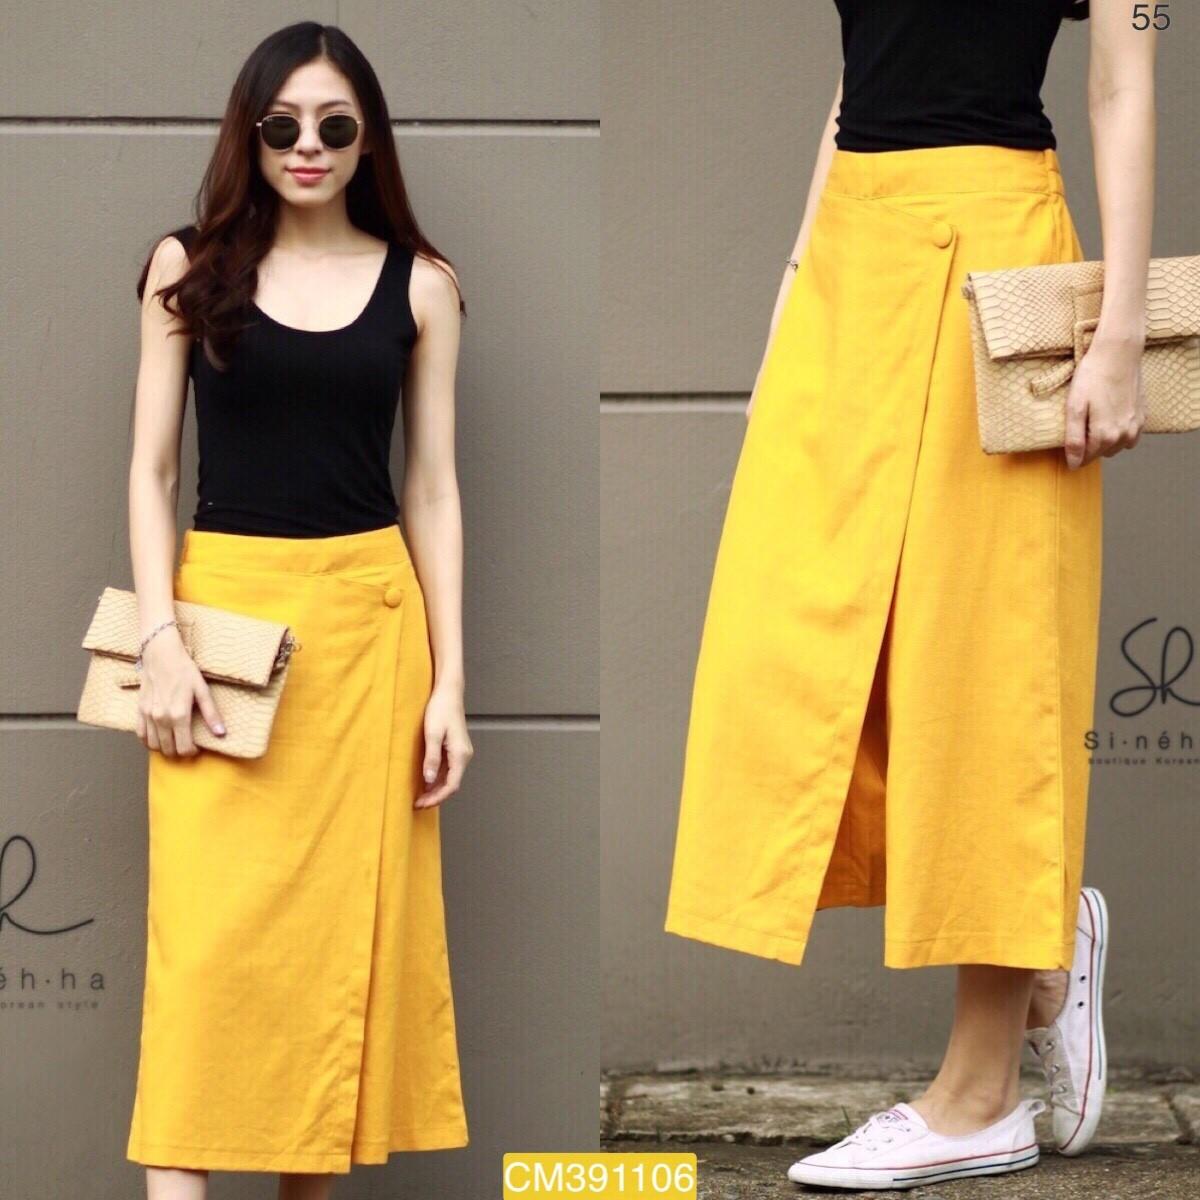 "CM1106 *สีเหลือง* เอว24-34"" กางเกงผ้าฝ้ายเนื้อดี"